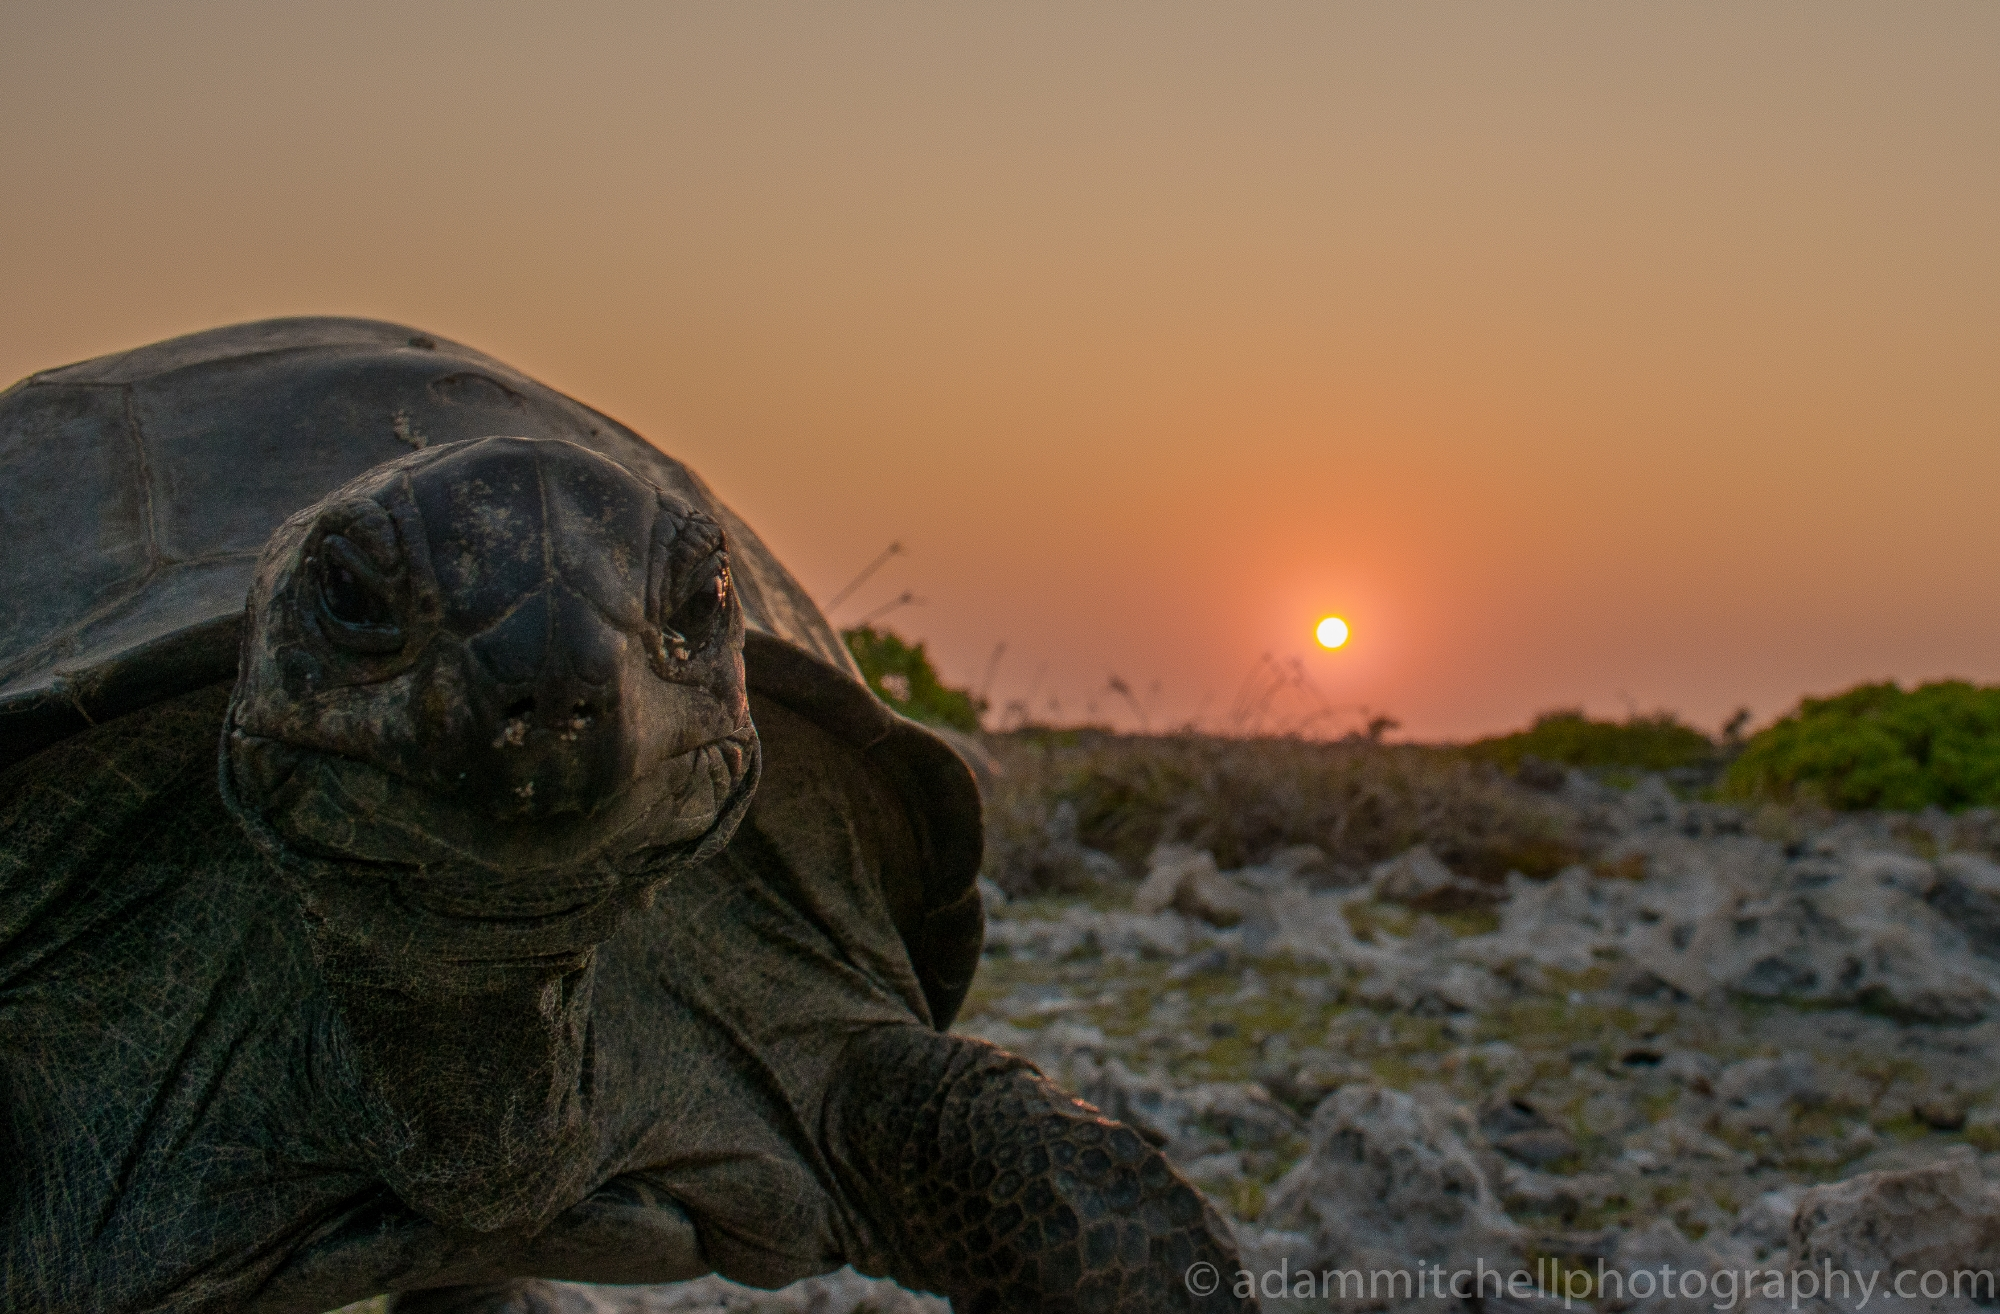 Tortoise photobomb, Aldabra